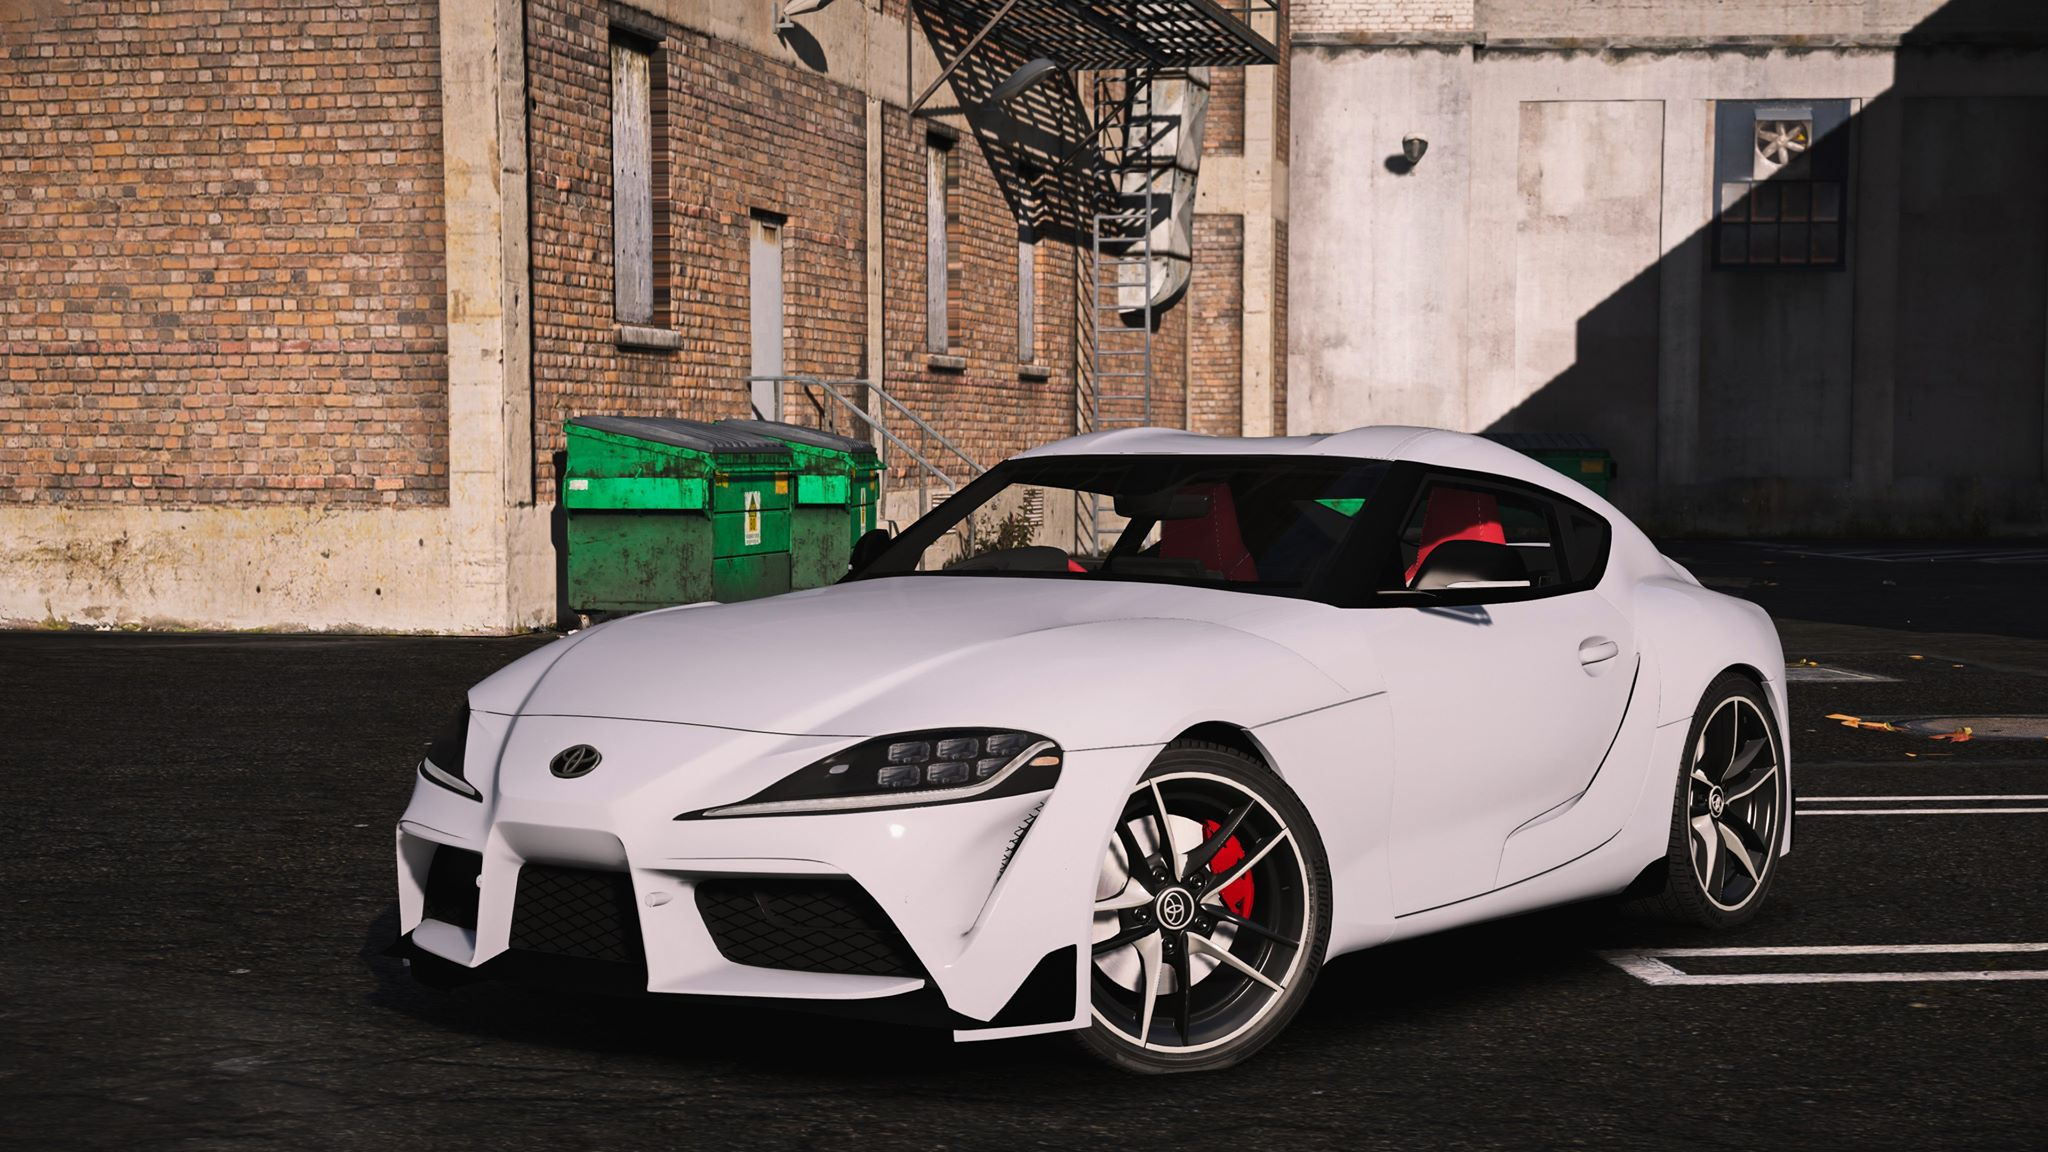 Toyota Supra 2020 Gta 5